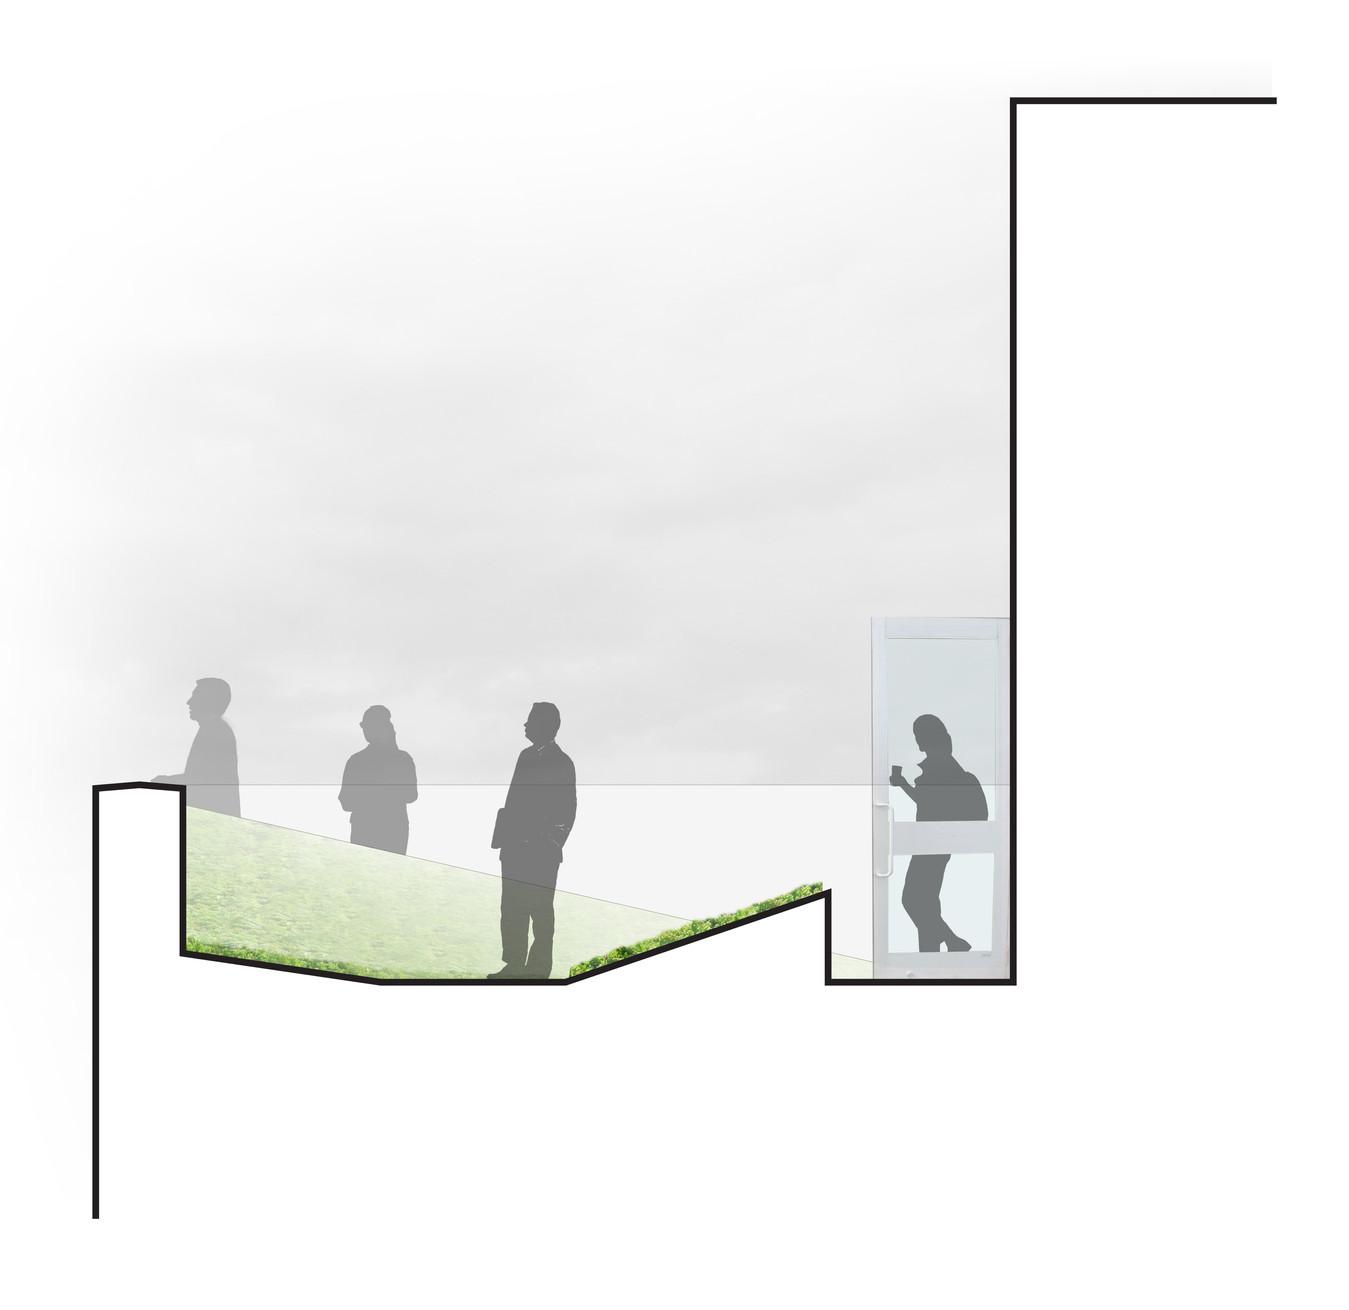 greenroof_shortsection_rendor_web.jpg